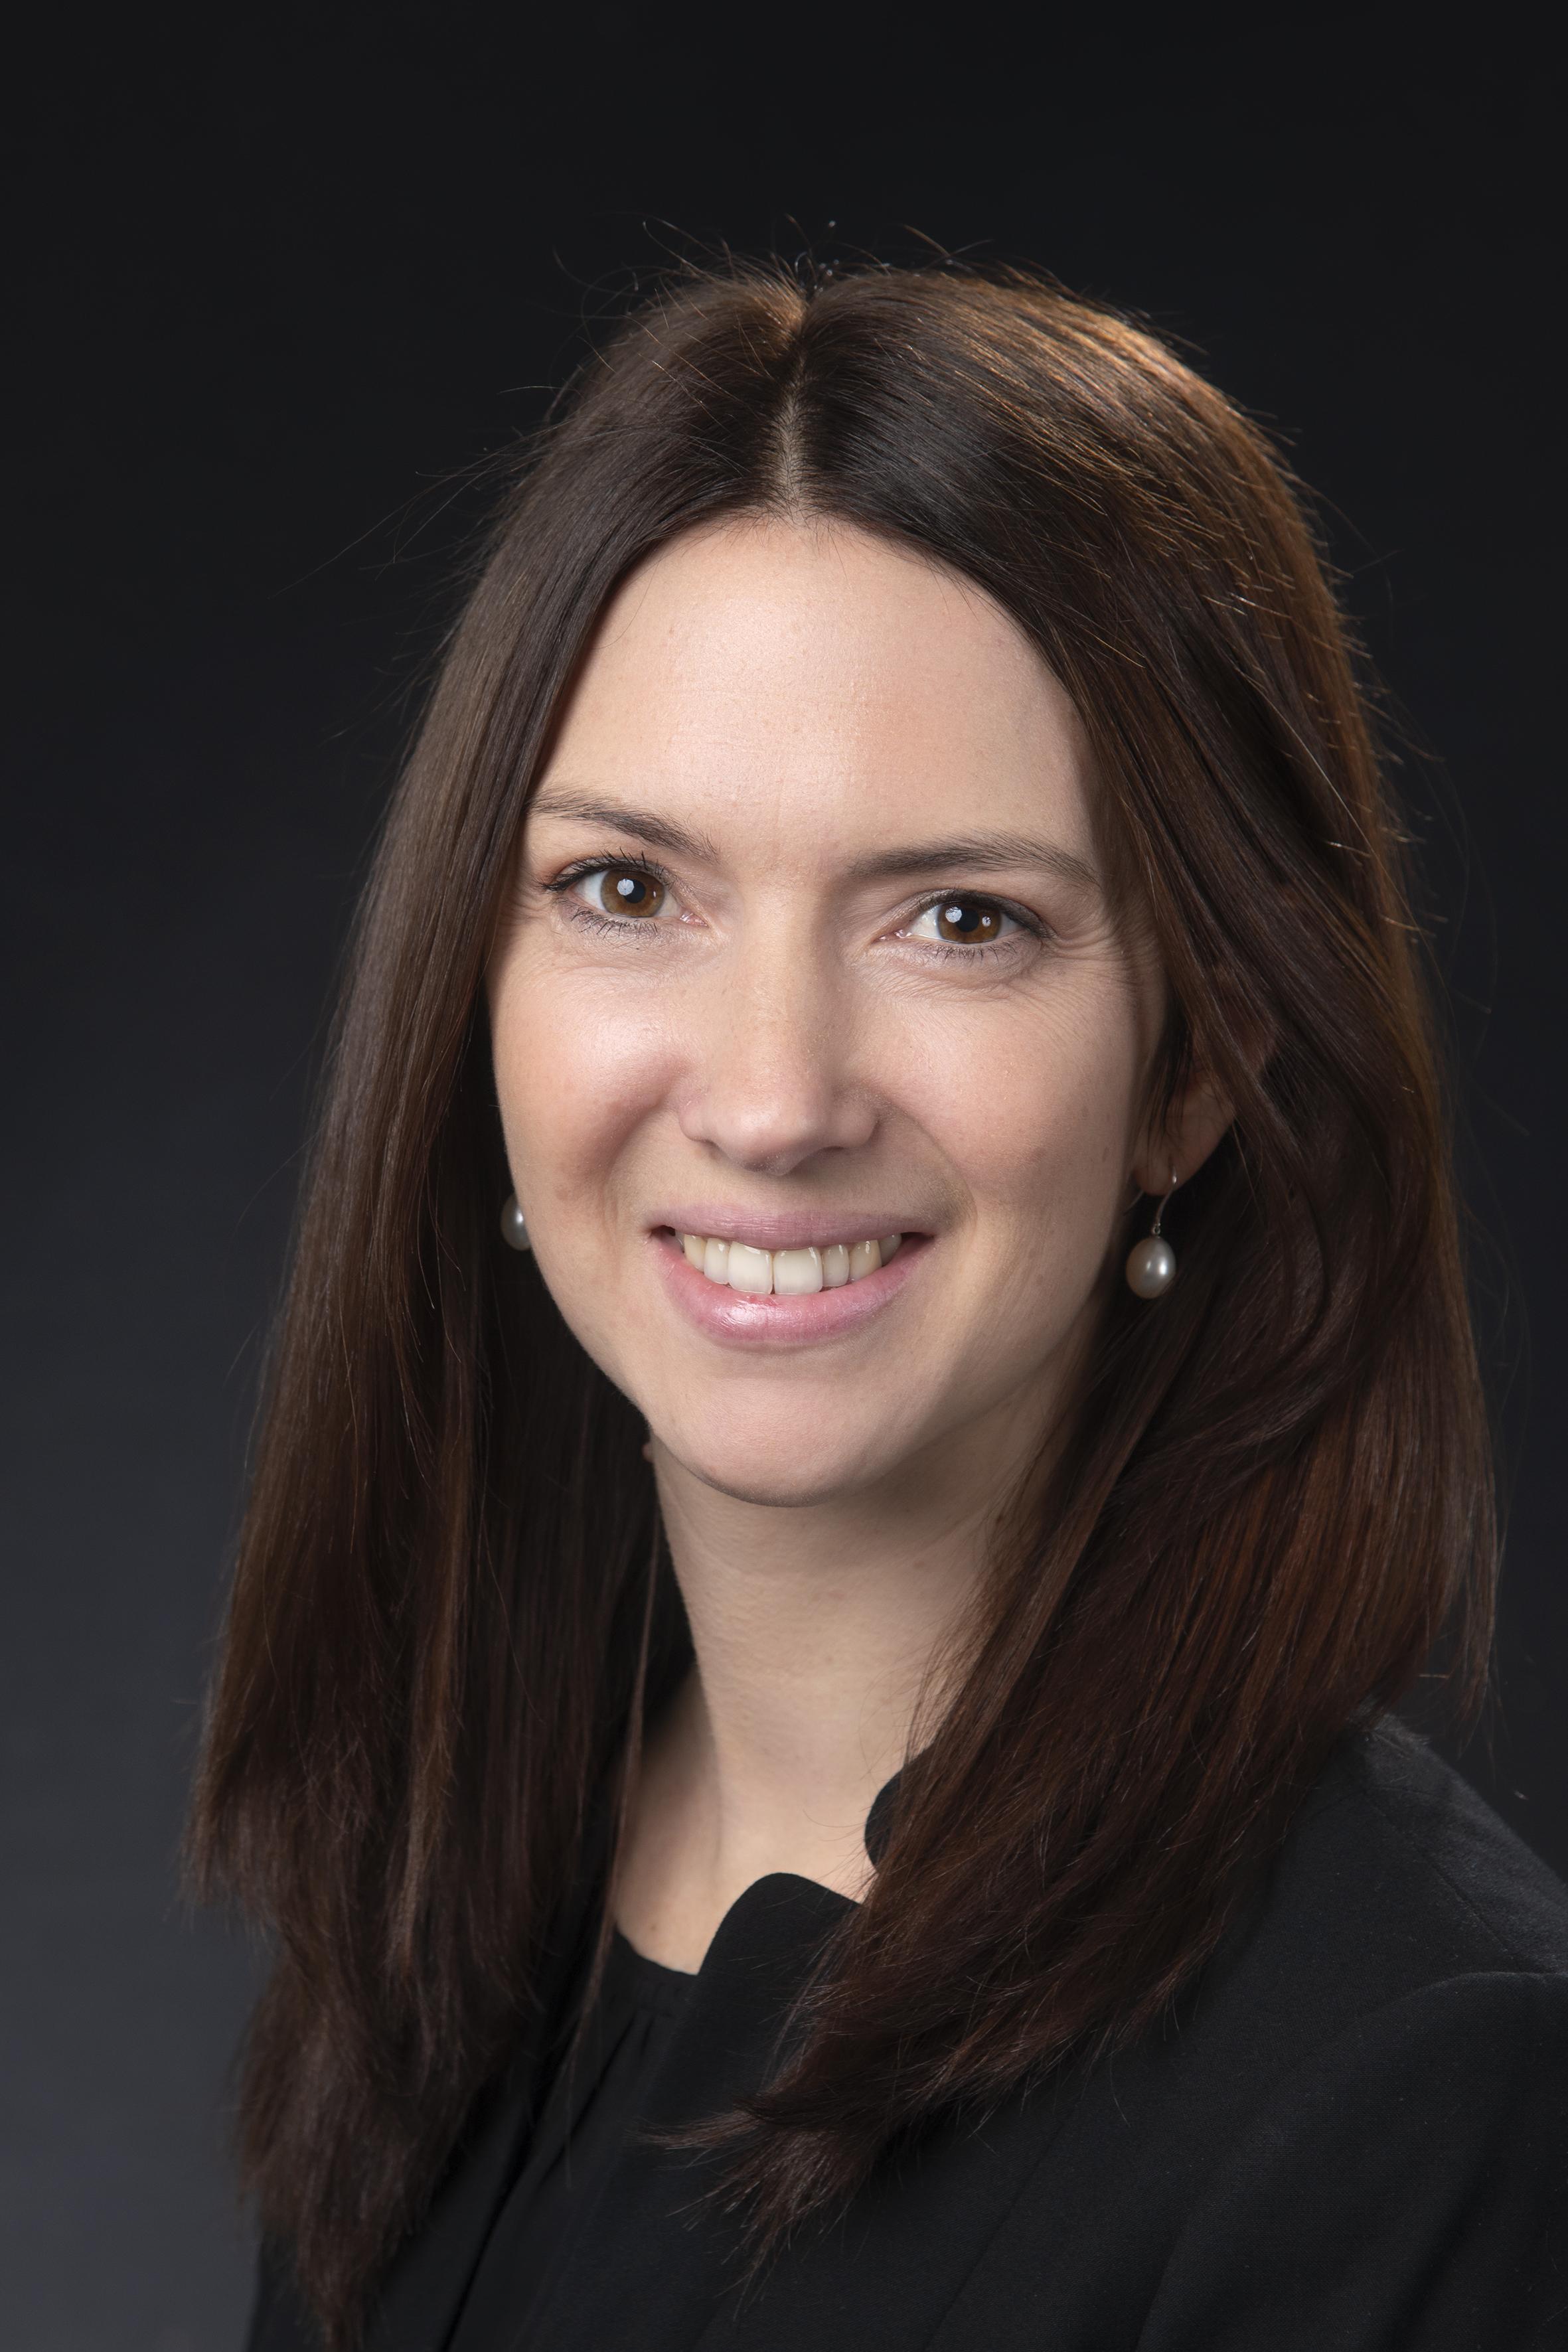 Kerstin Bauereiß, Produktmanagement, EP Ehrler Prüftechnik